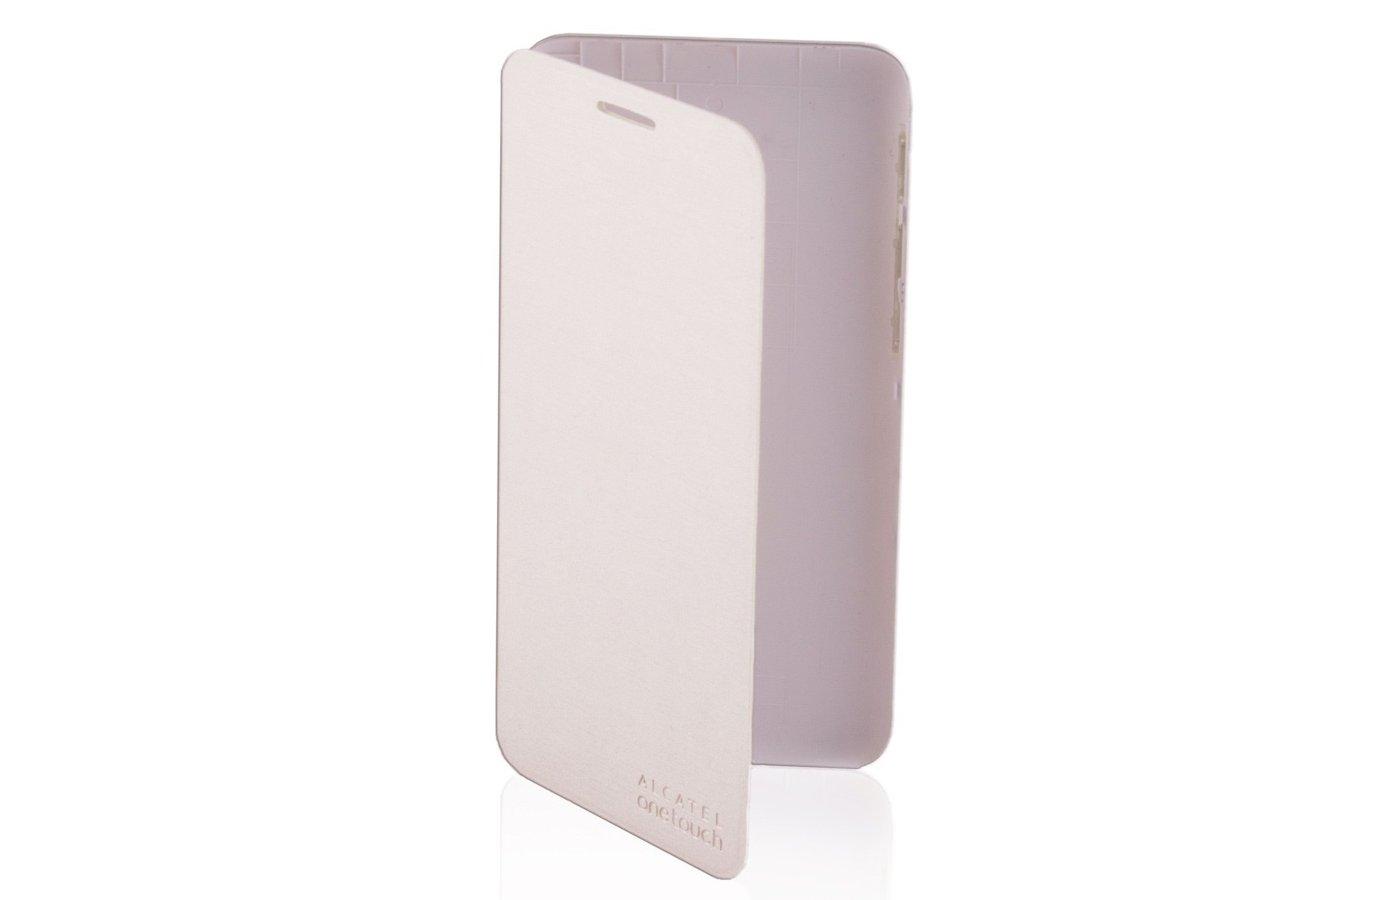 Чехол Alcatel для Alcatel One Touch POP 3 5015D silver